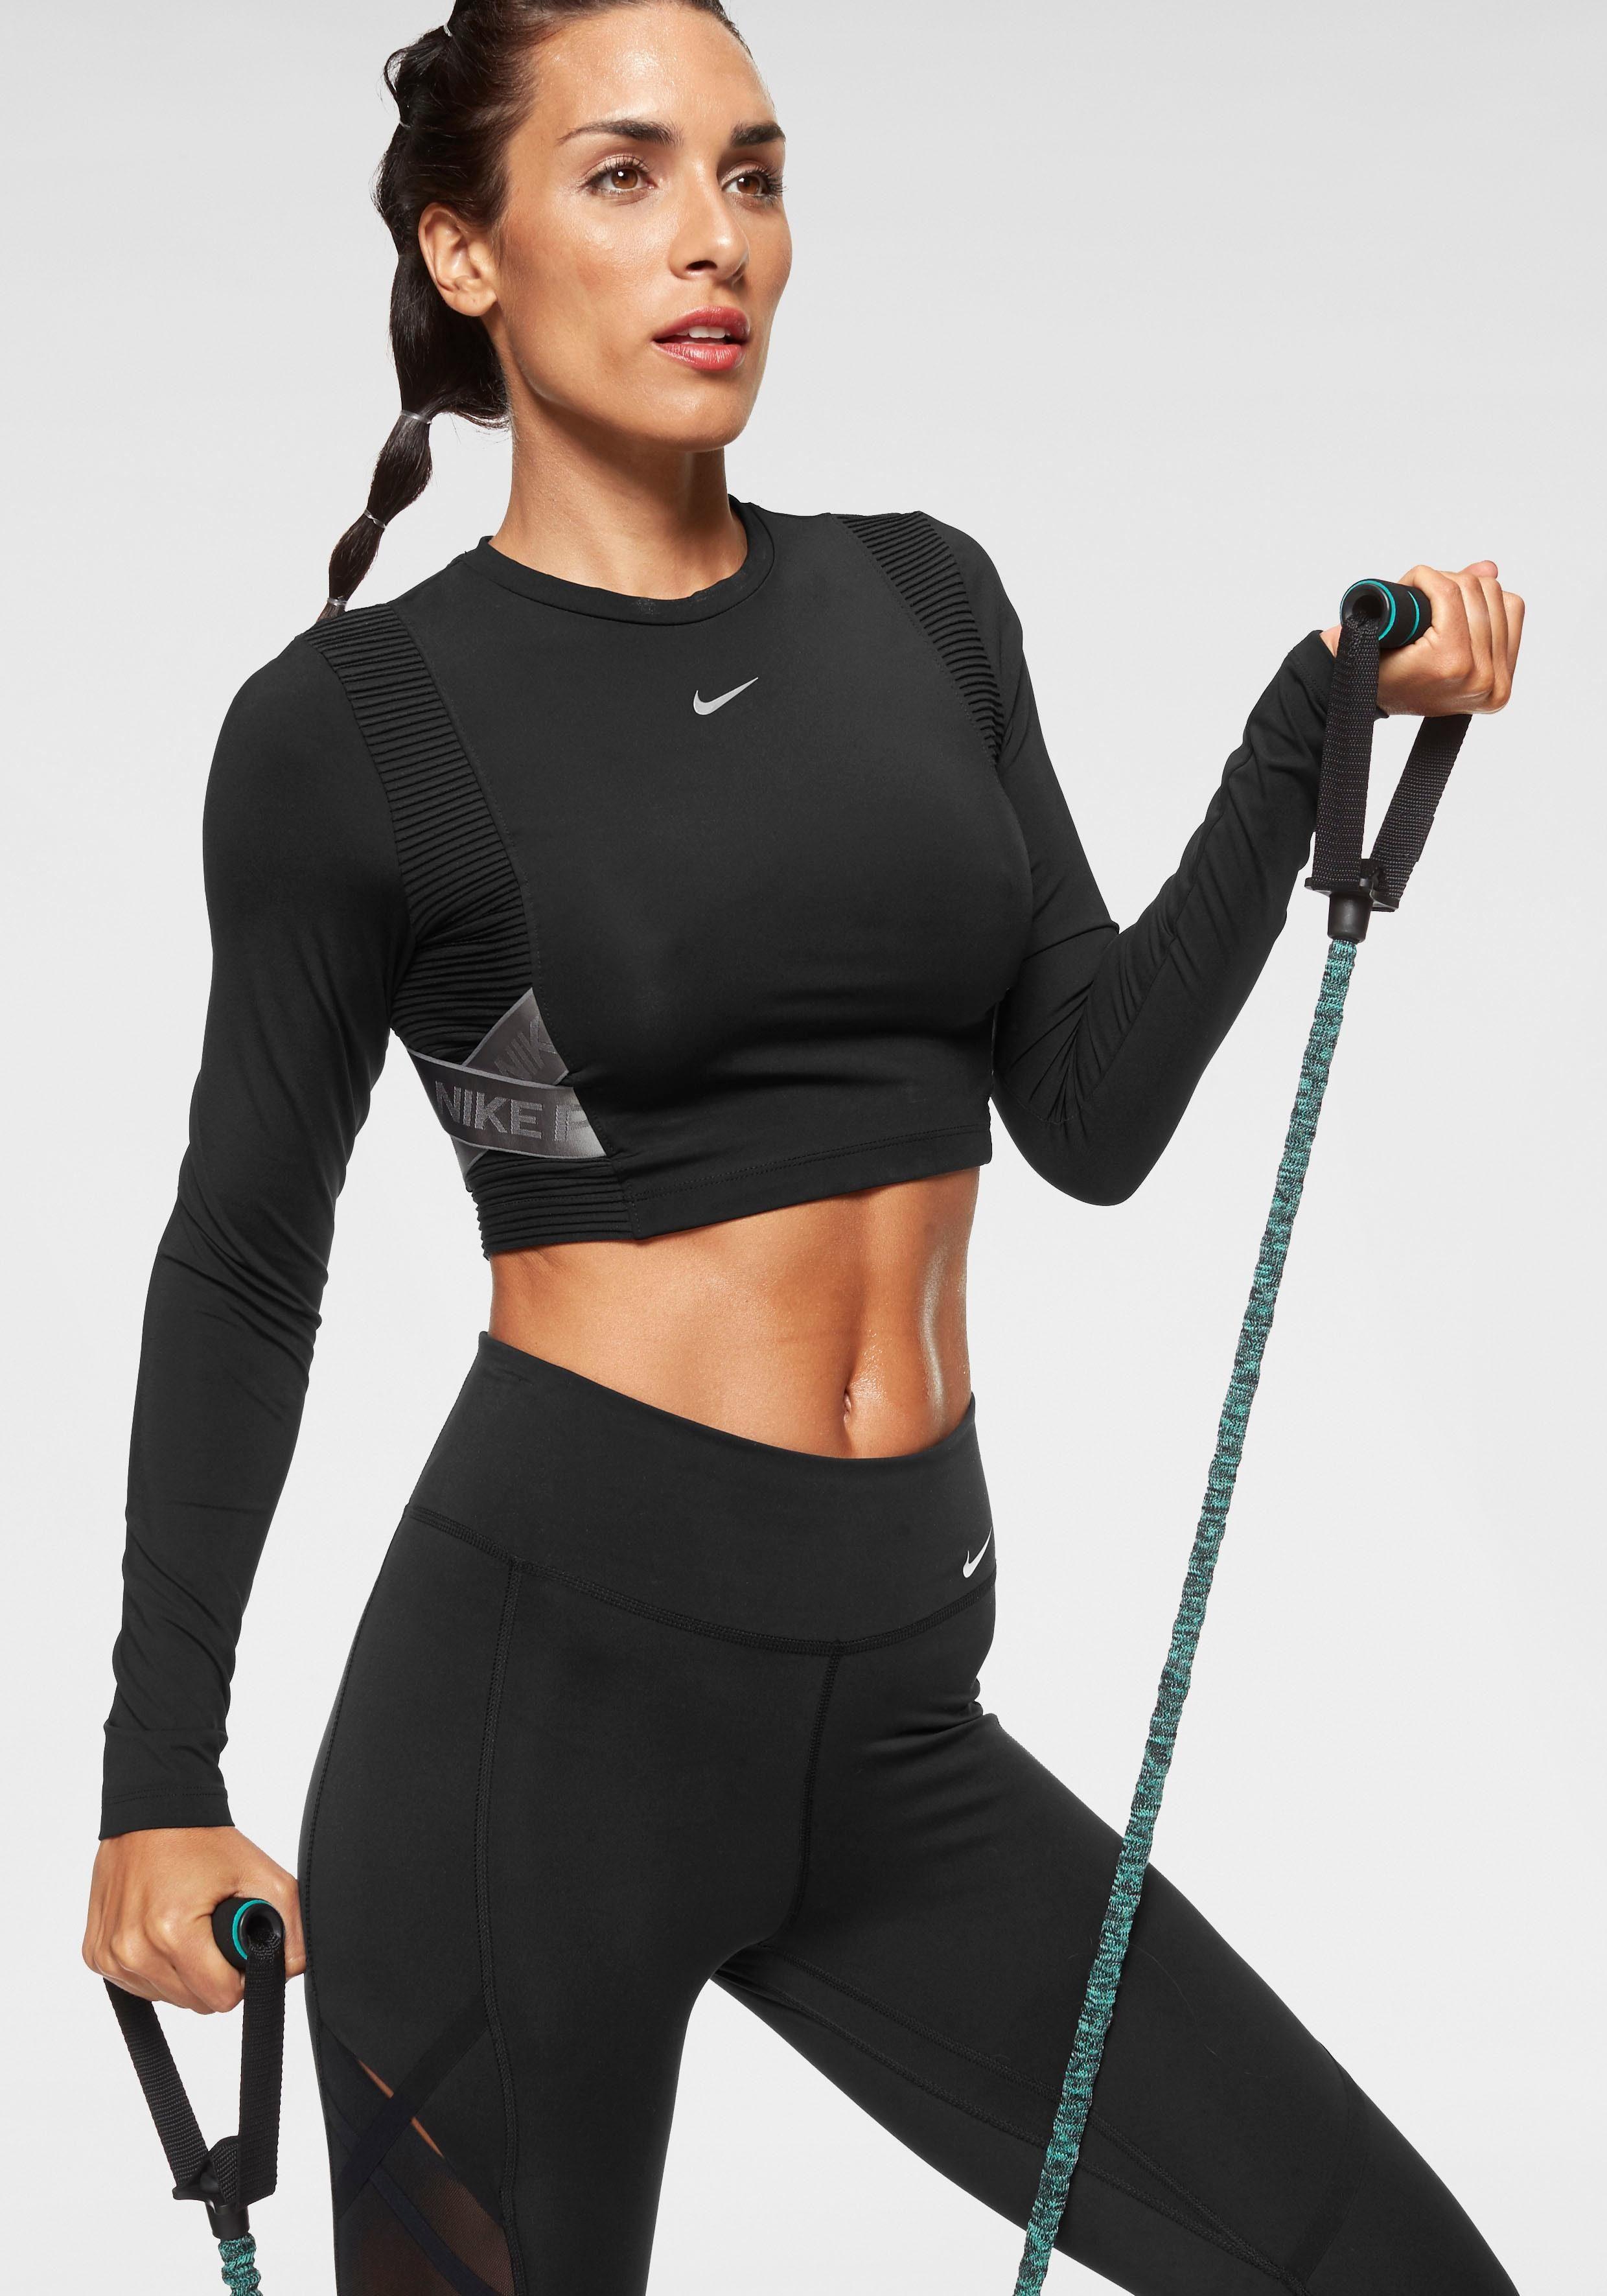 Puma Women's Rebel Run LS Top Long Sleeve Shirt, Womens